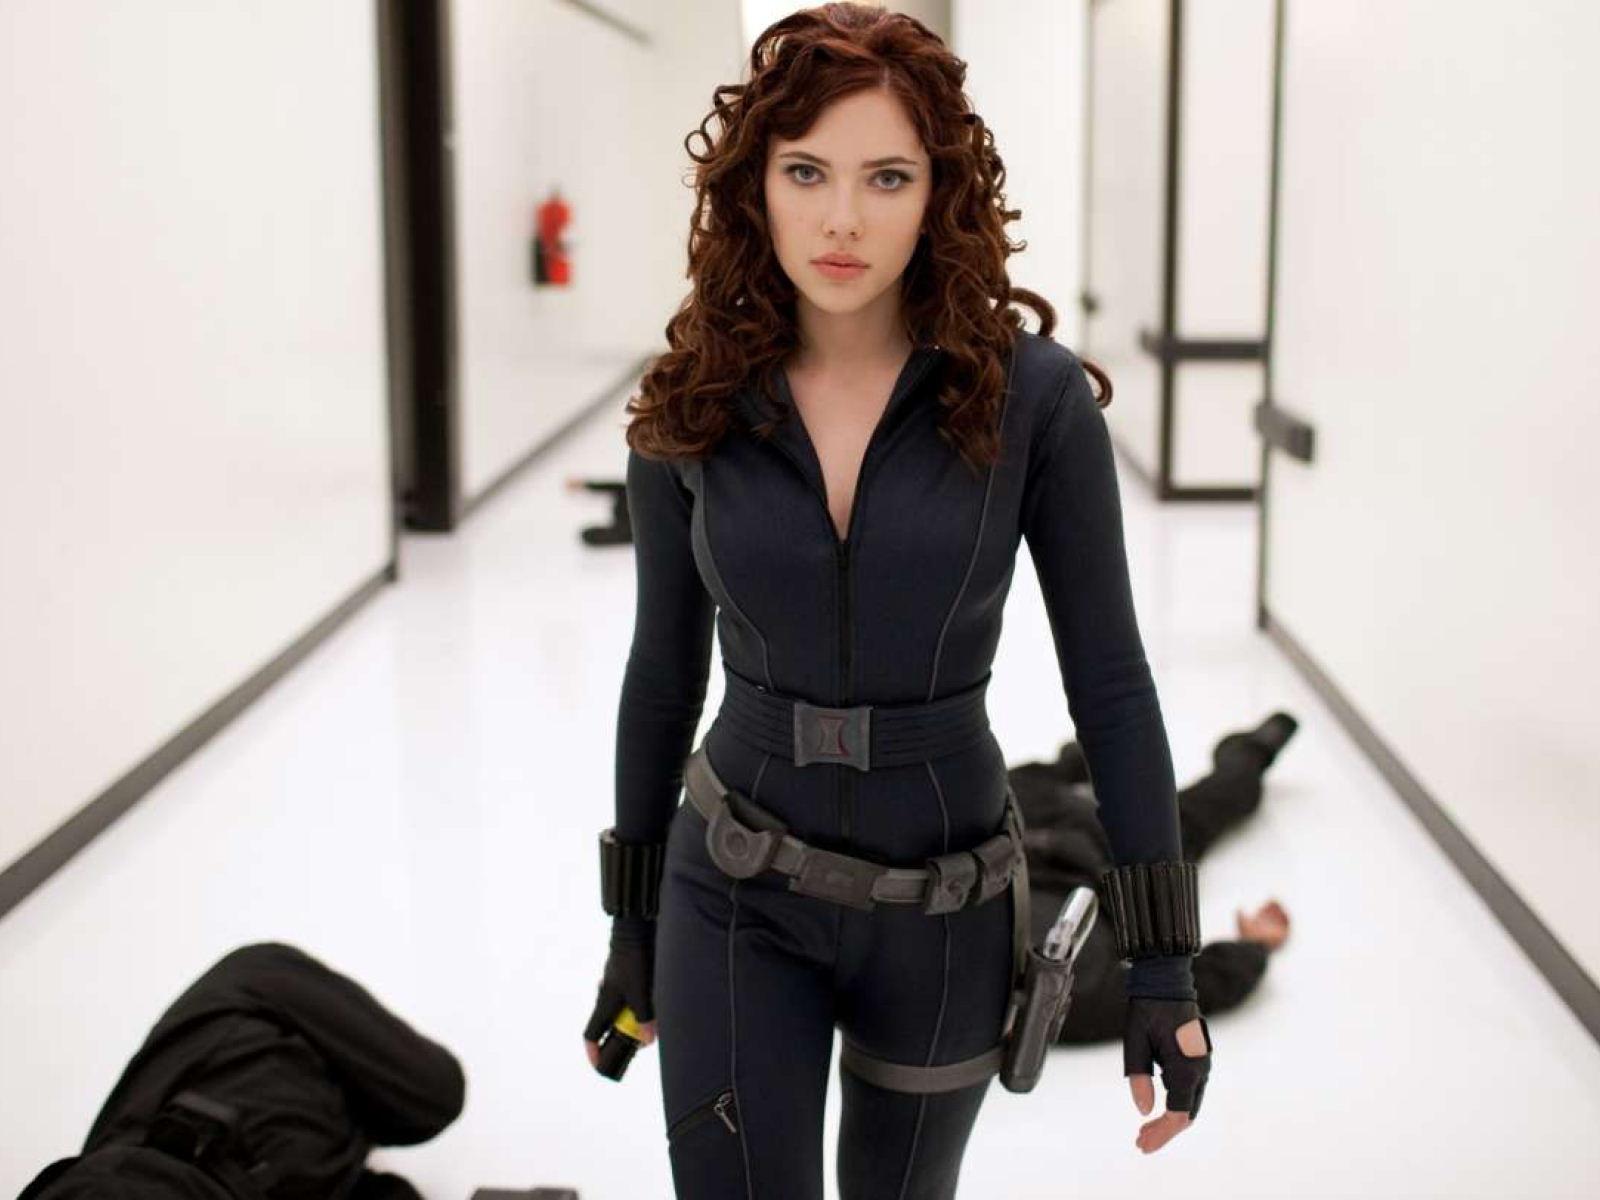 Black Widow   Scarlett Johansson   The Avengers 1 1600x1200